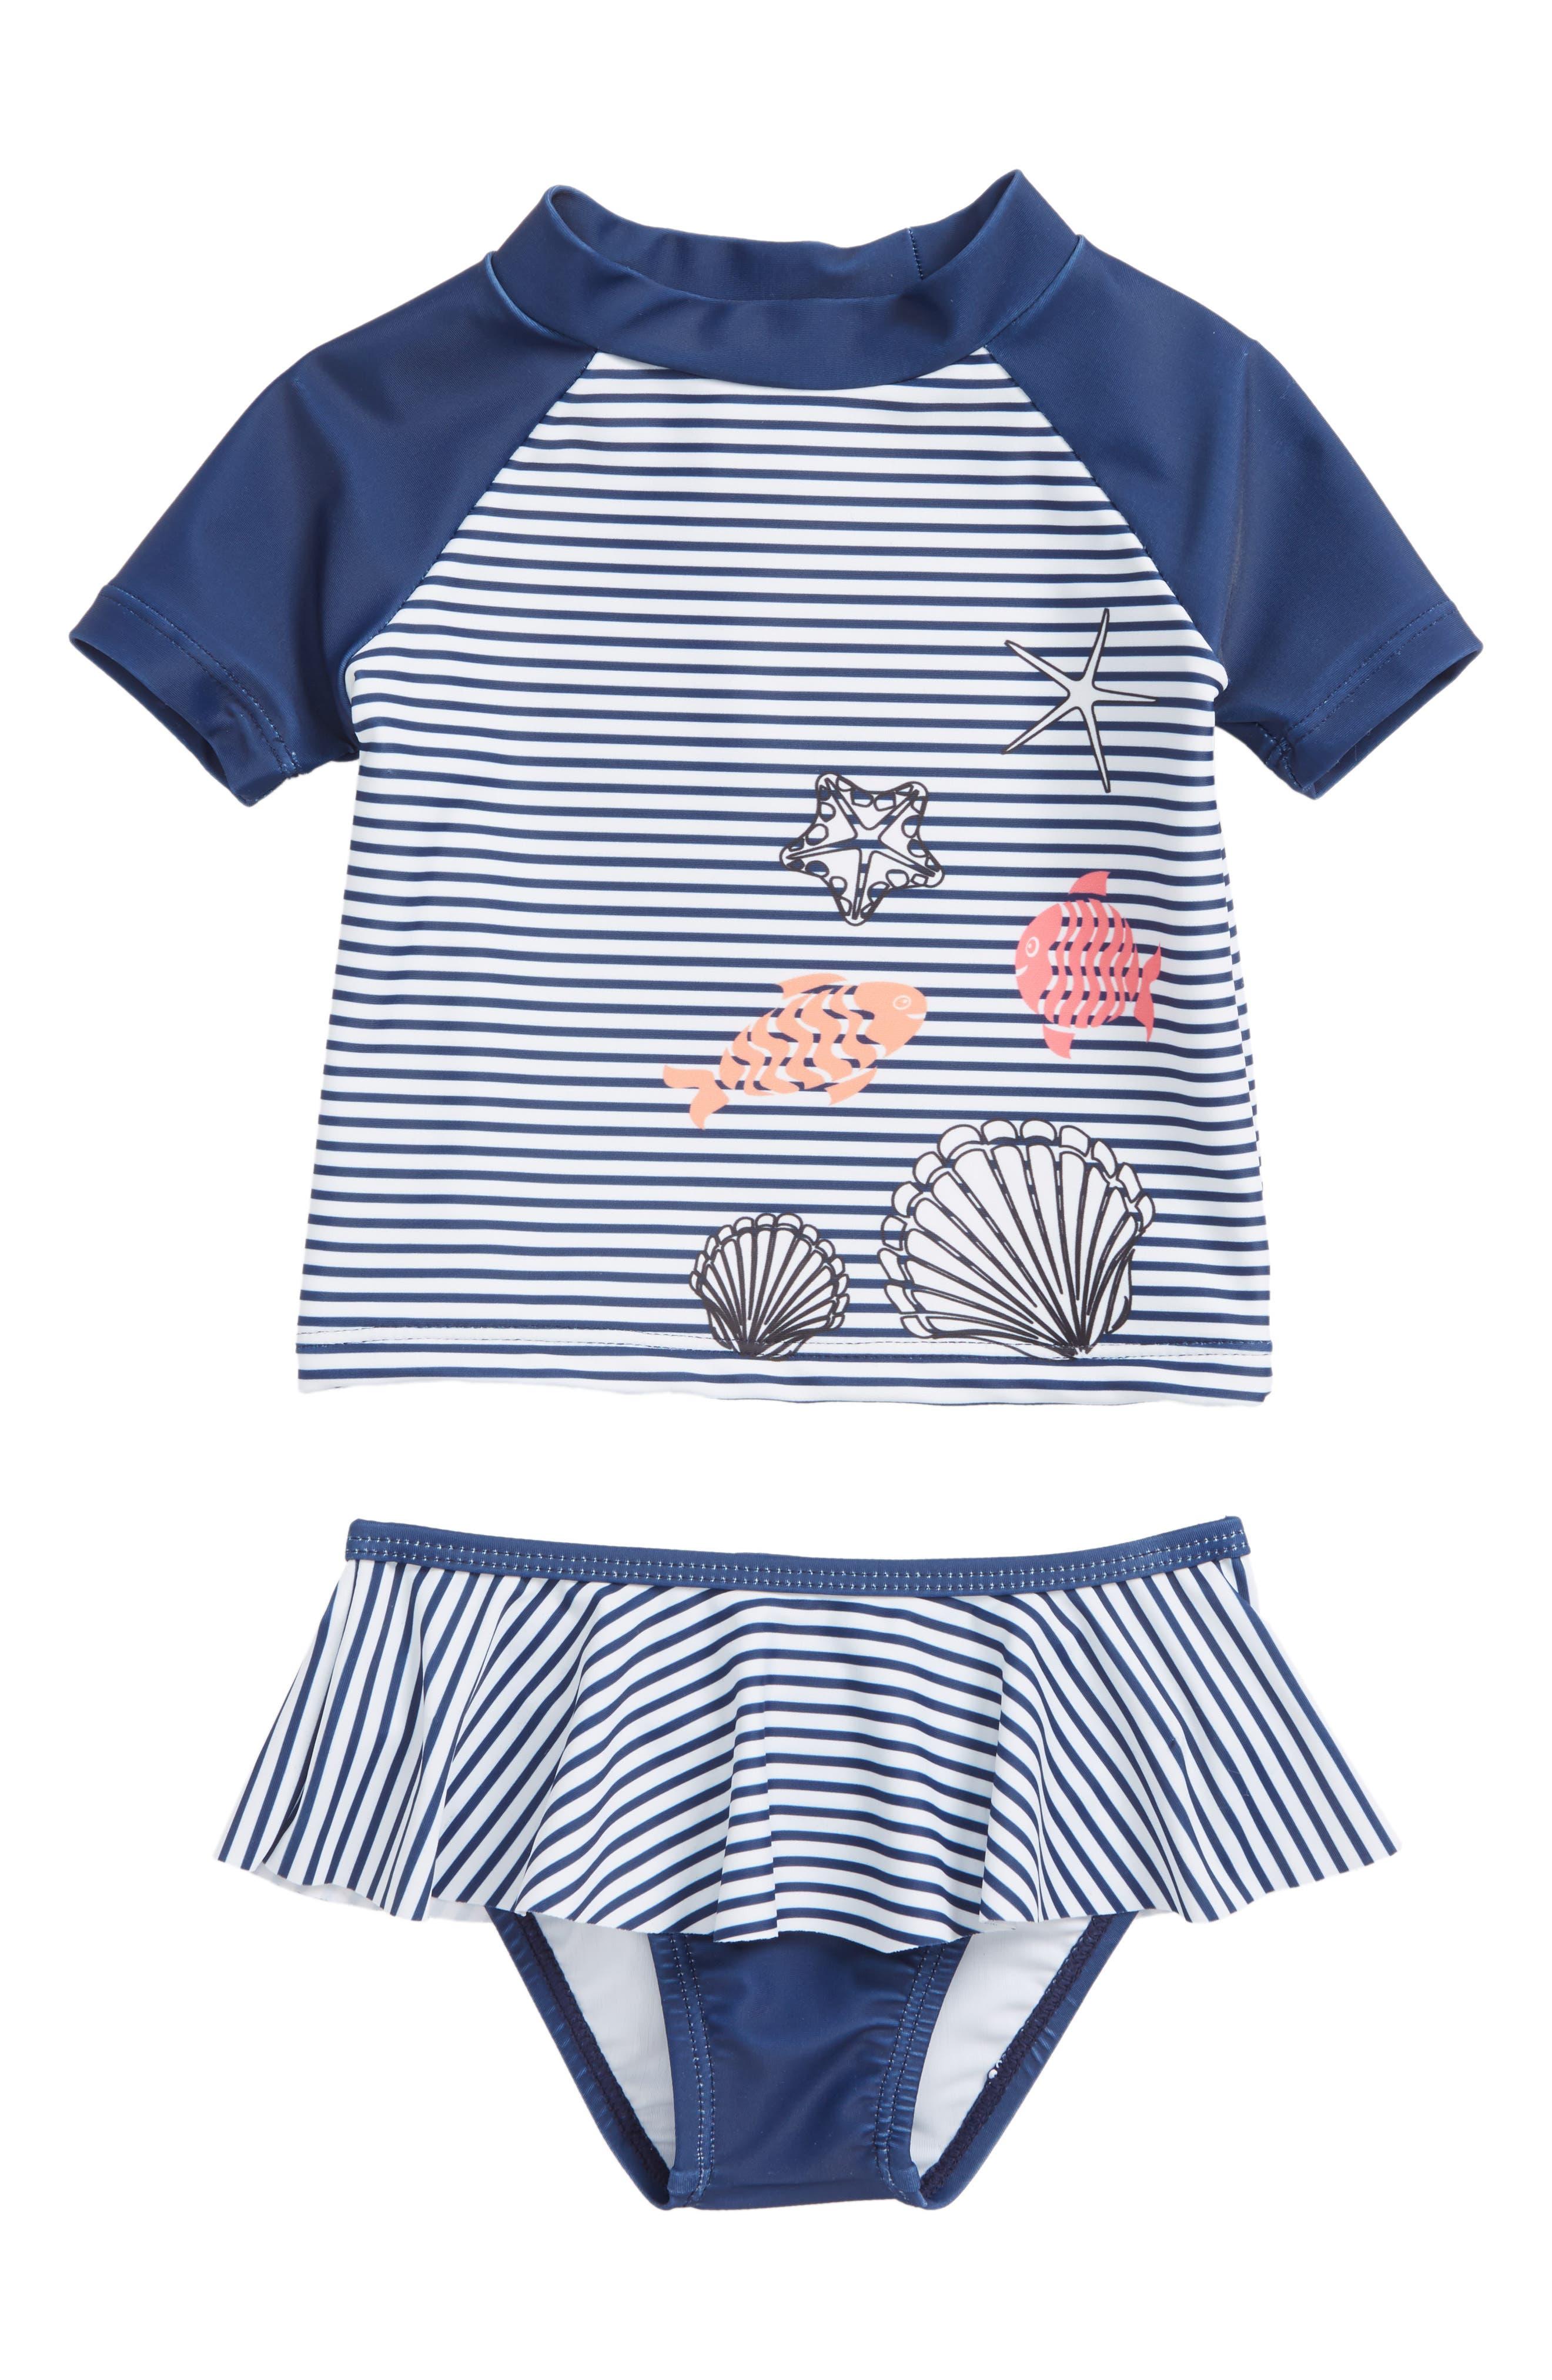 Skirted Two-Piece Rashguard Swimsuit,                         Main,                         color, Navy